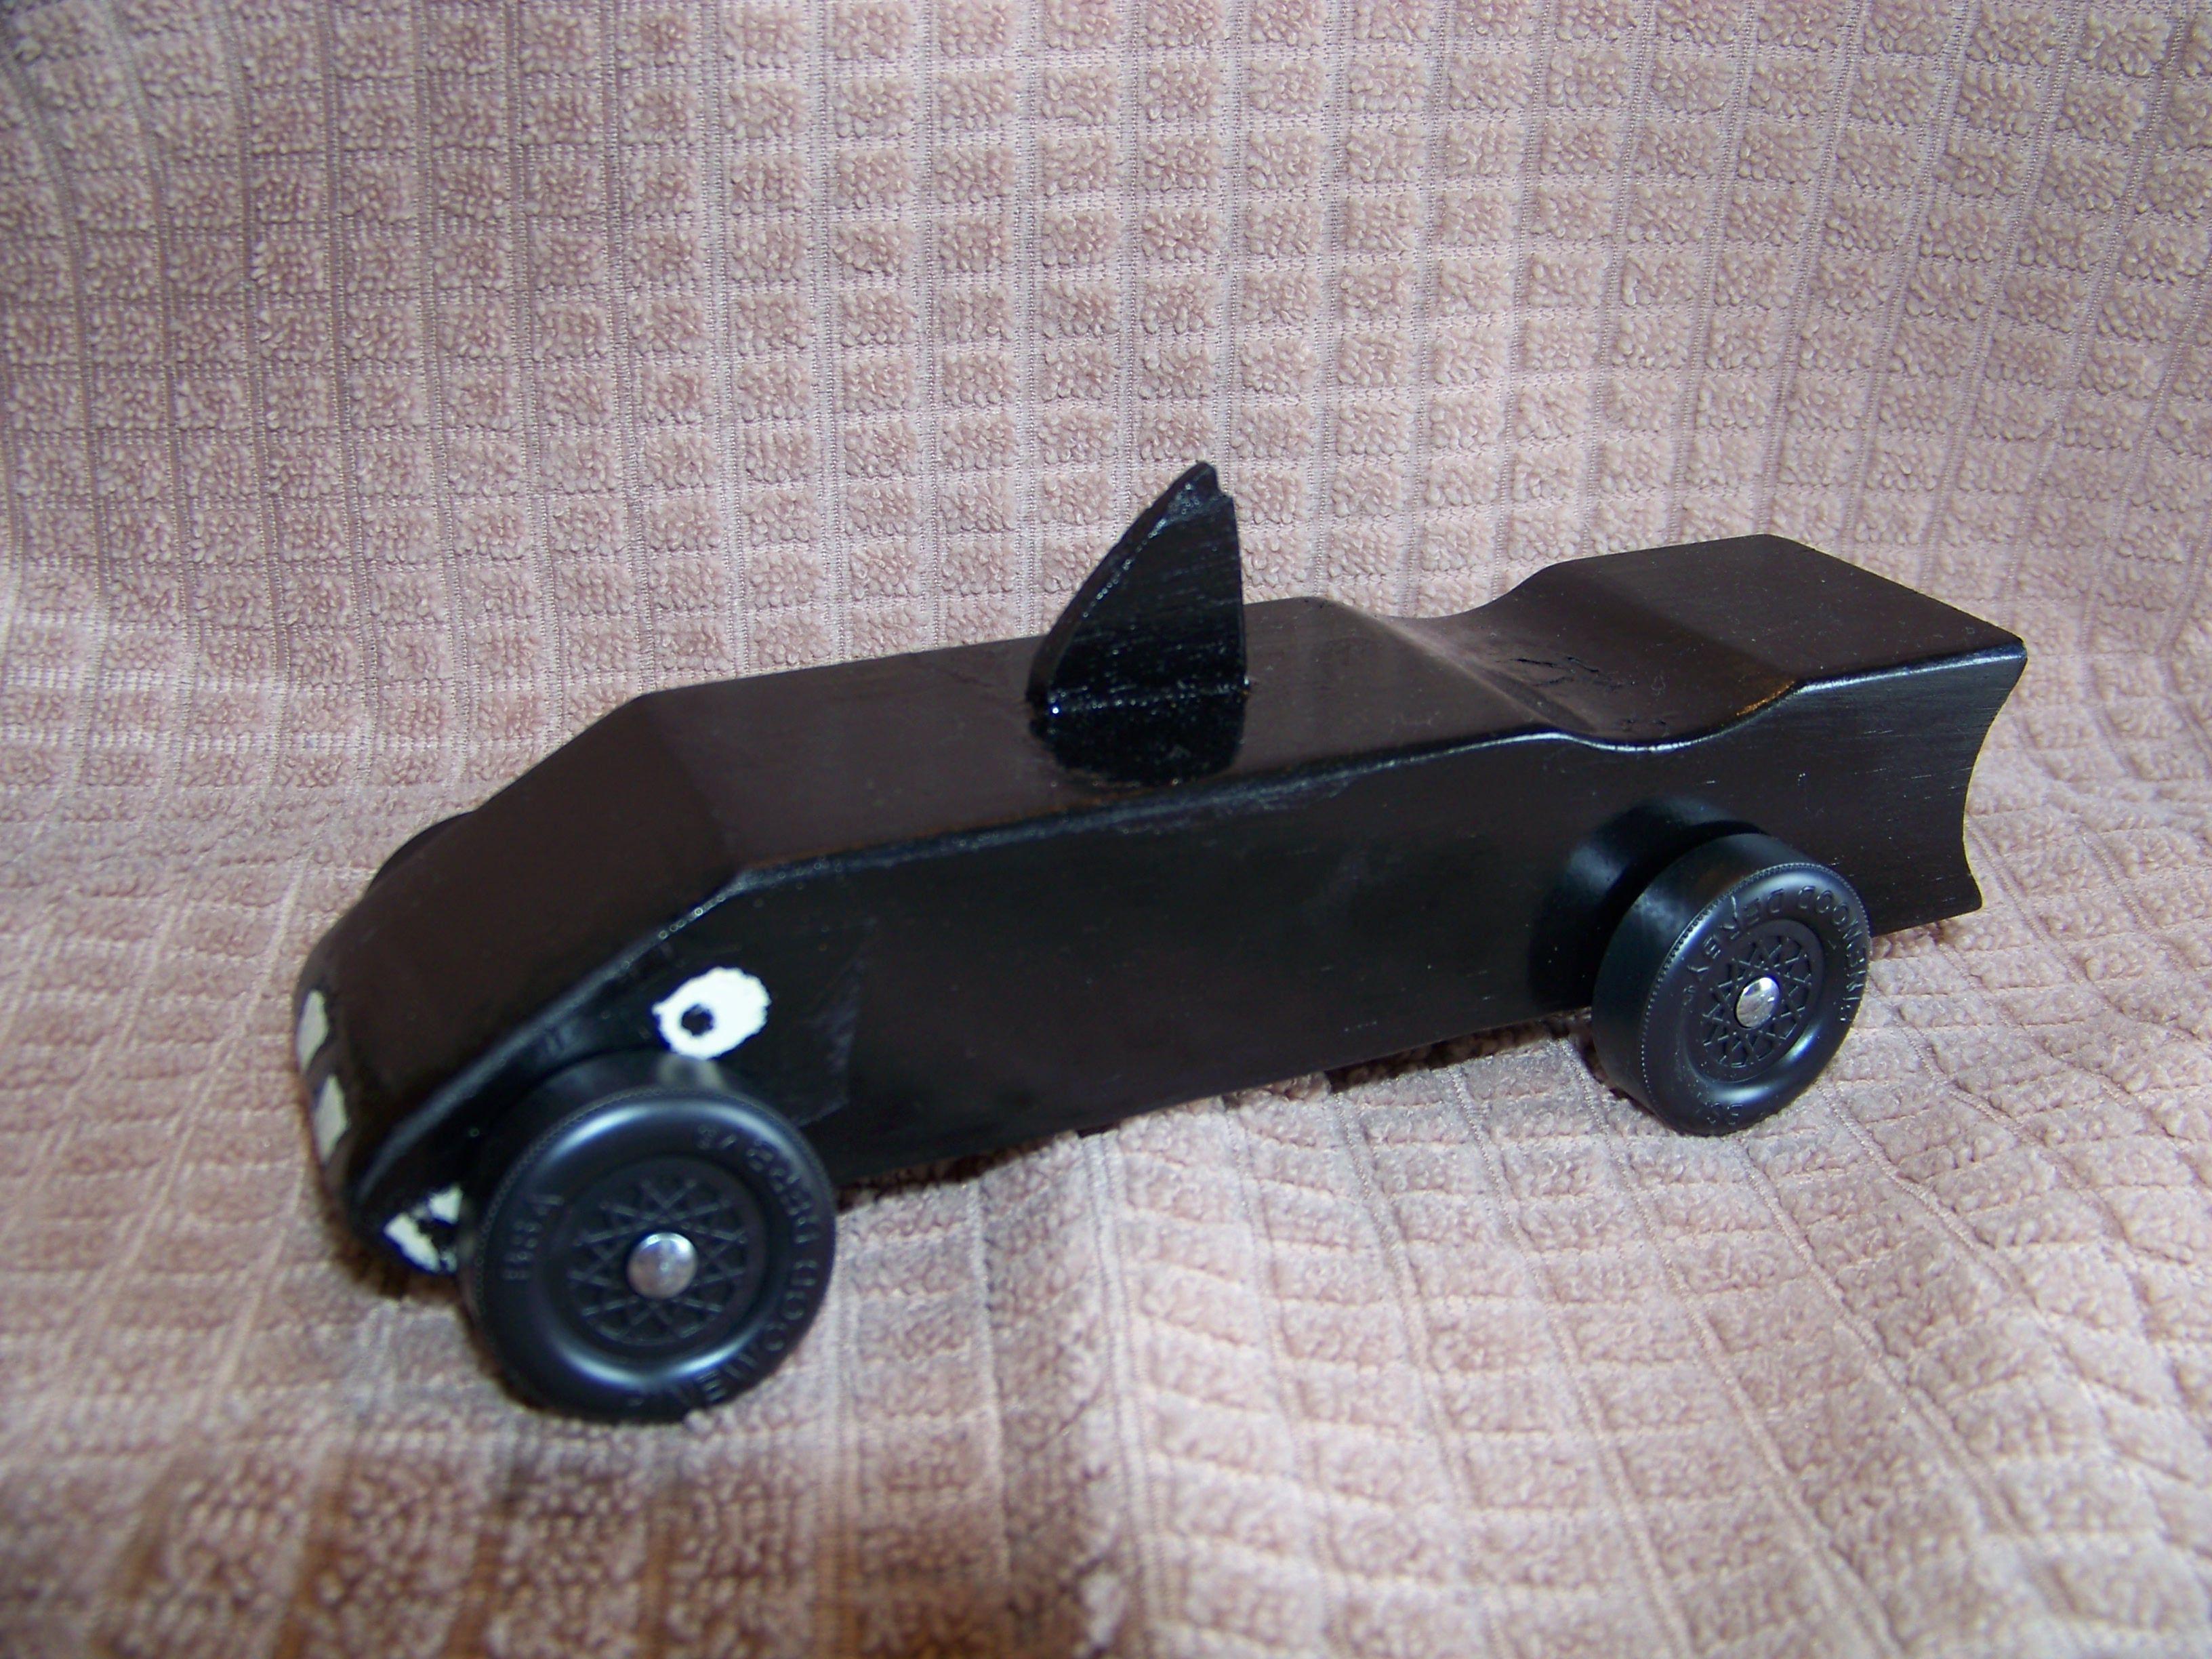 Shark Pinewood Derby Car Awesome Shark Pine Wood Derby Car Cub Scout Ideas